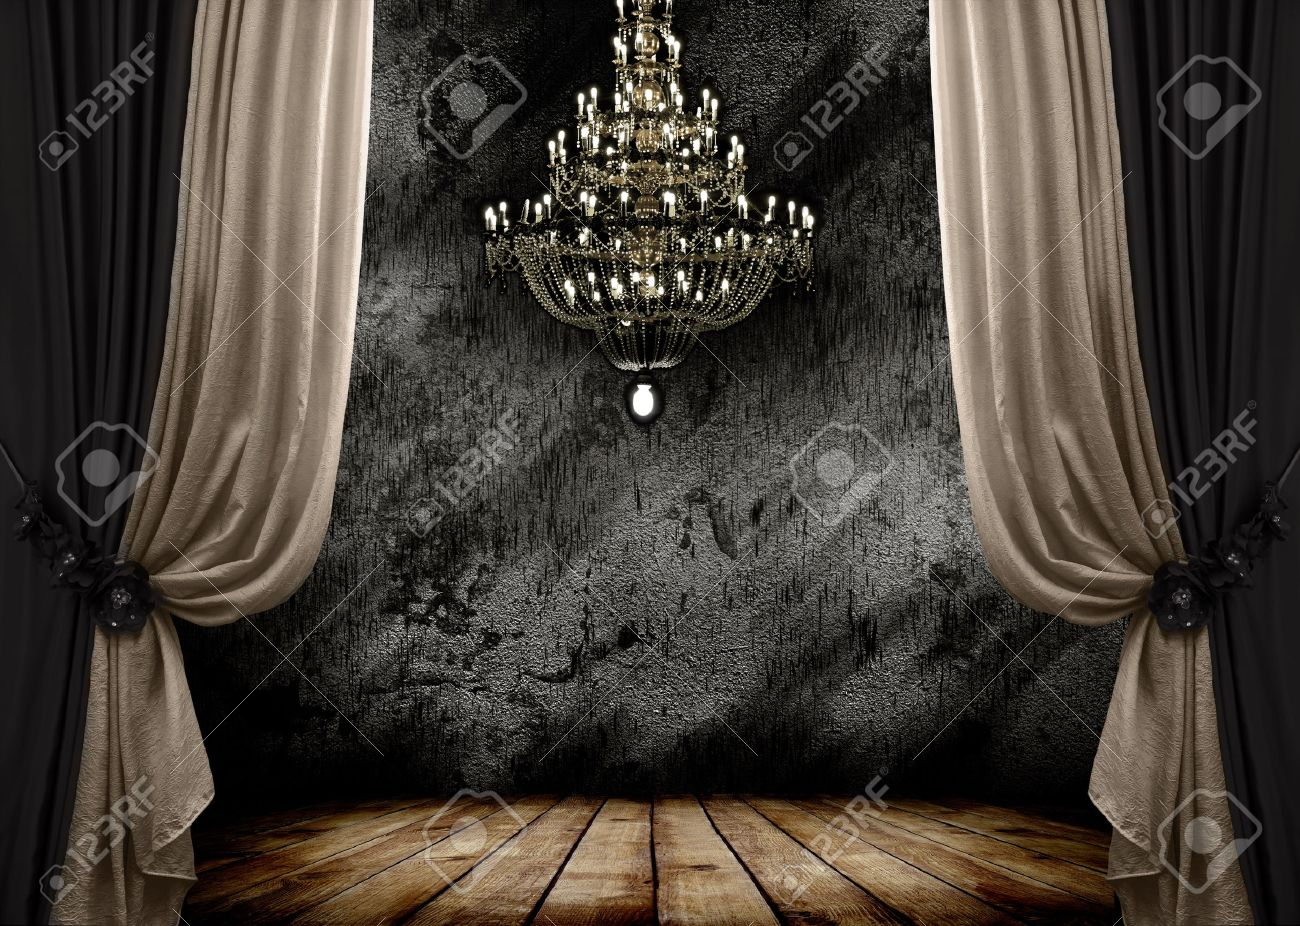 Image Of Grunge Dark Room Interior With Wood Floor And Chandelier 1300x926